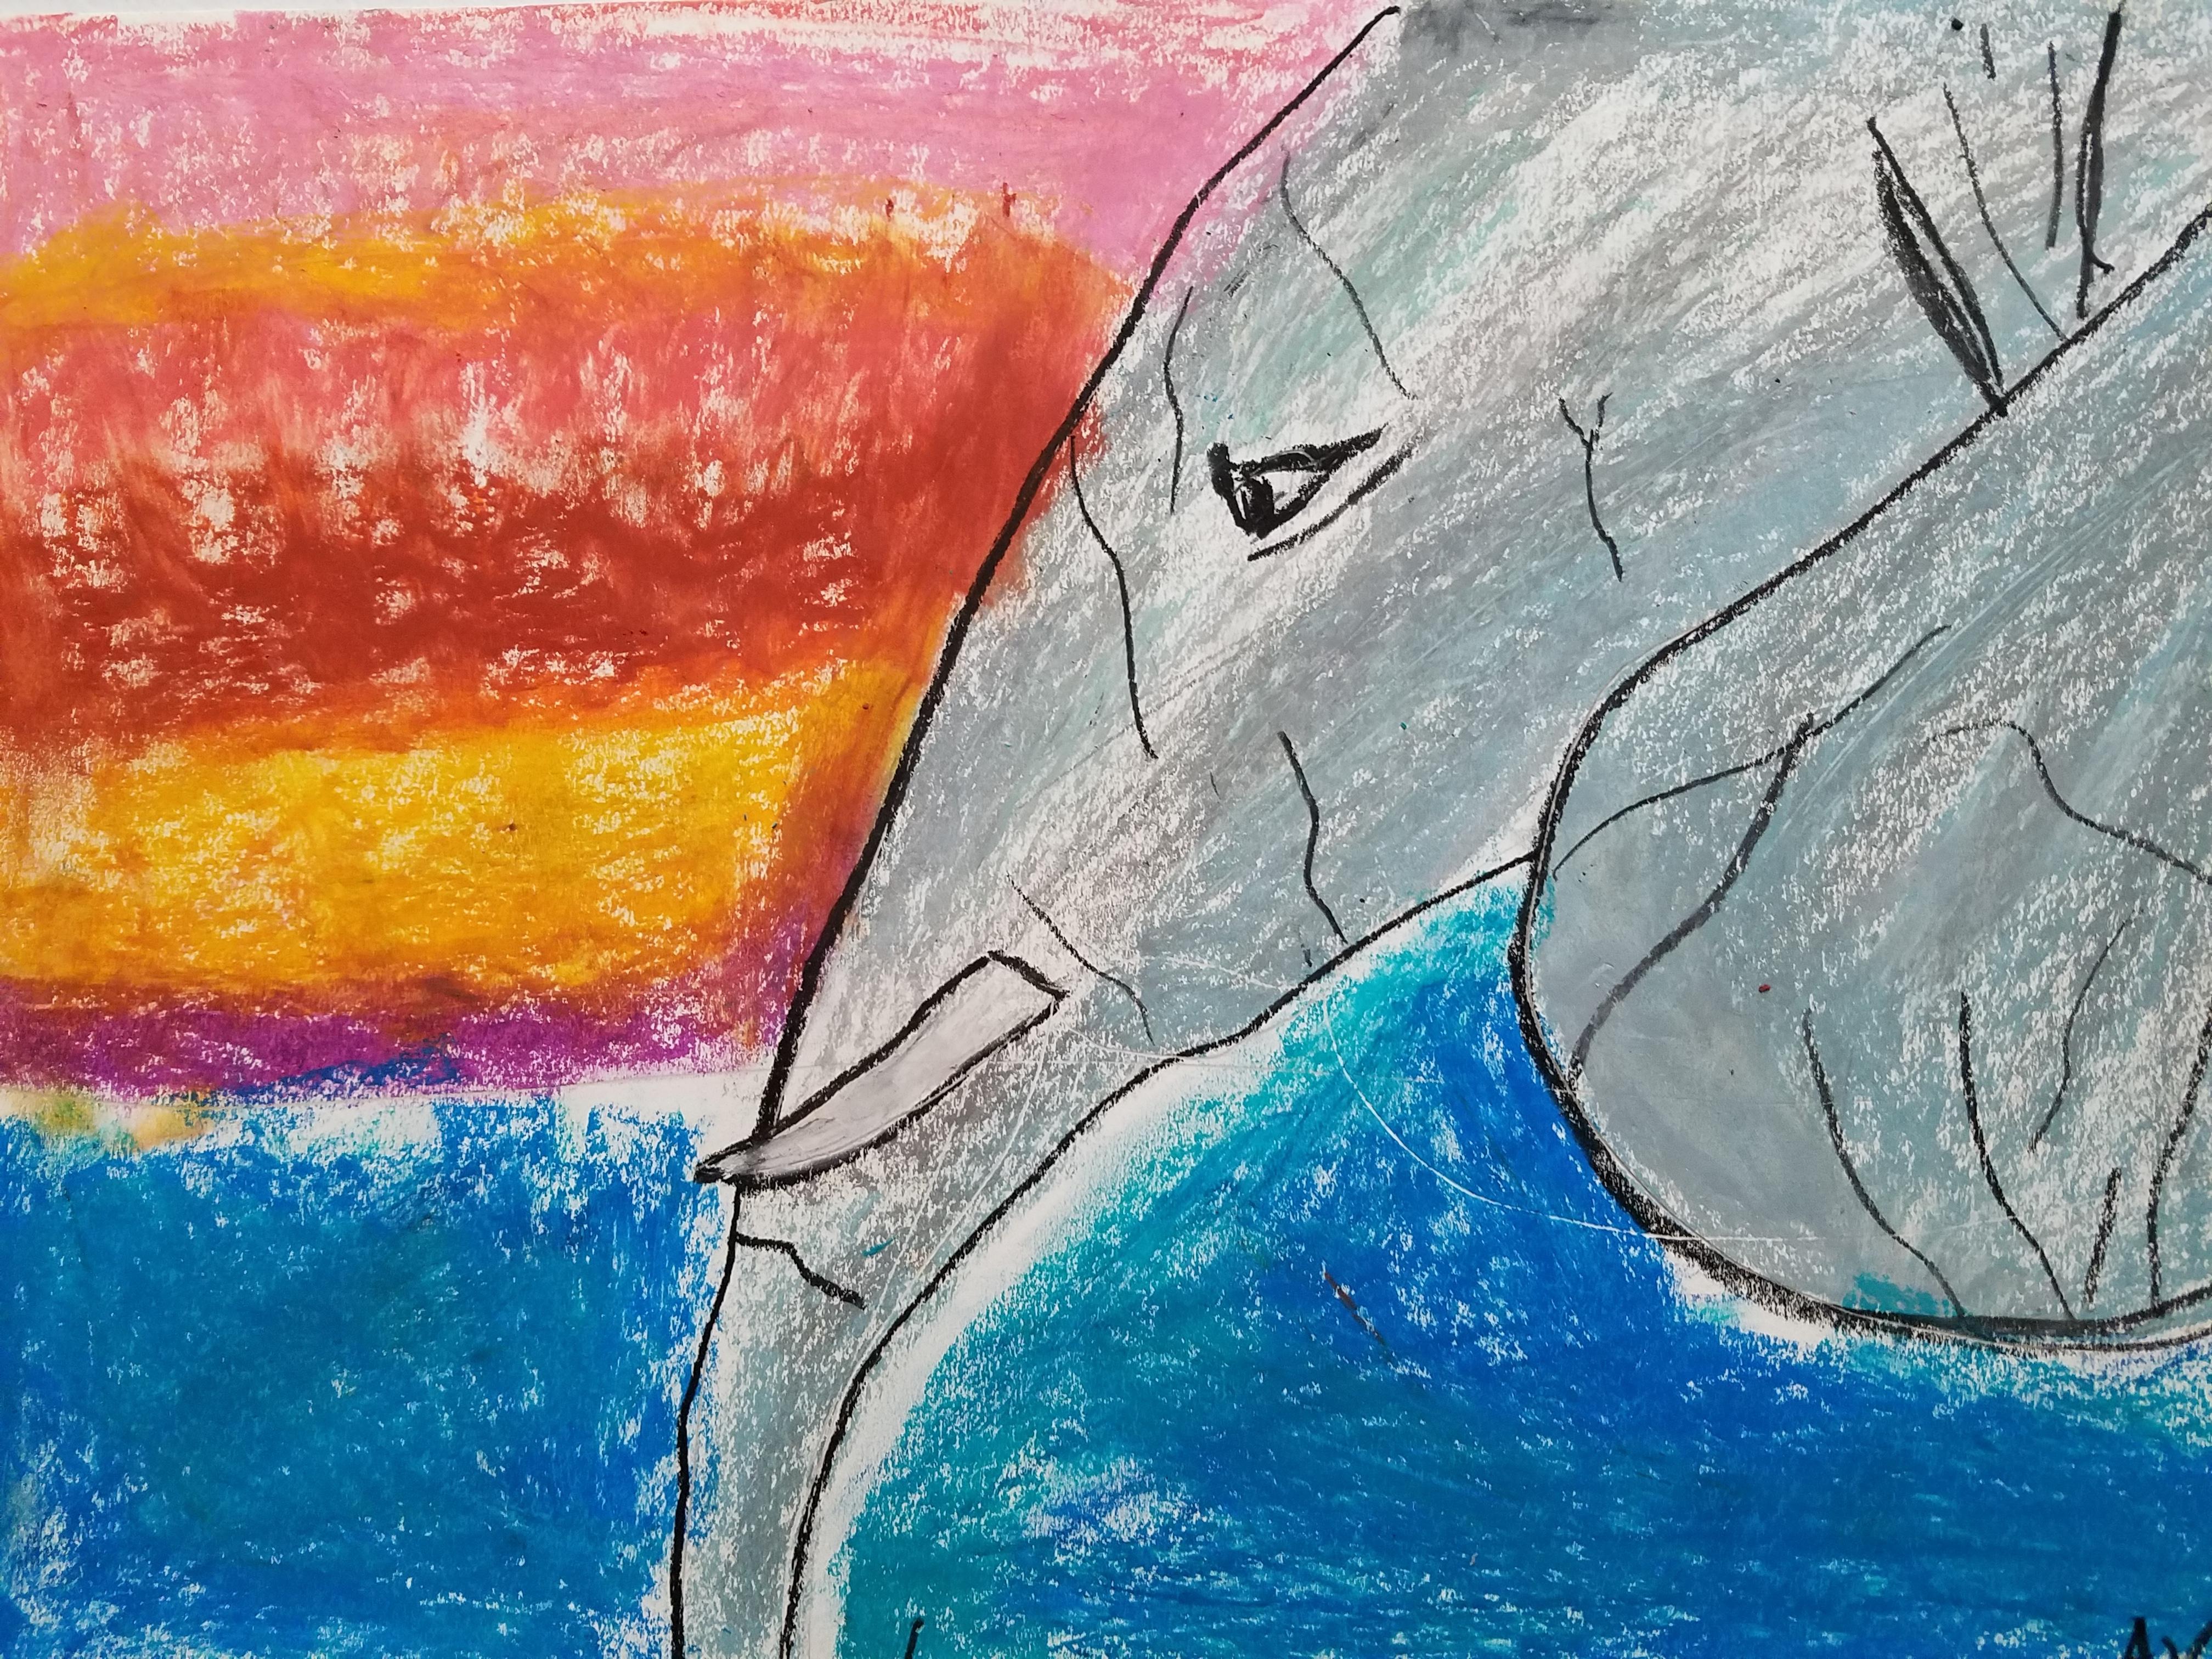 Elephant Art - Age 8